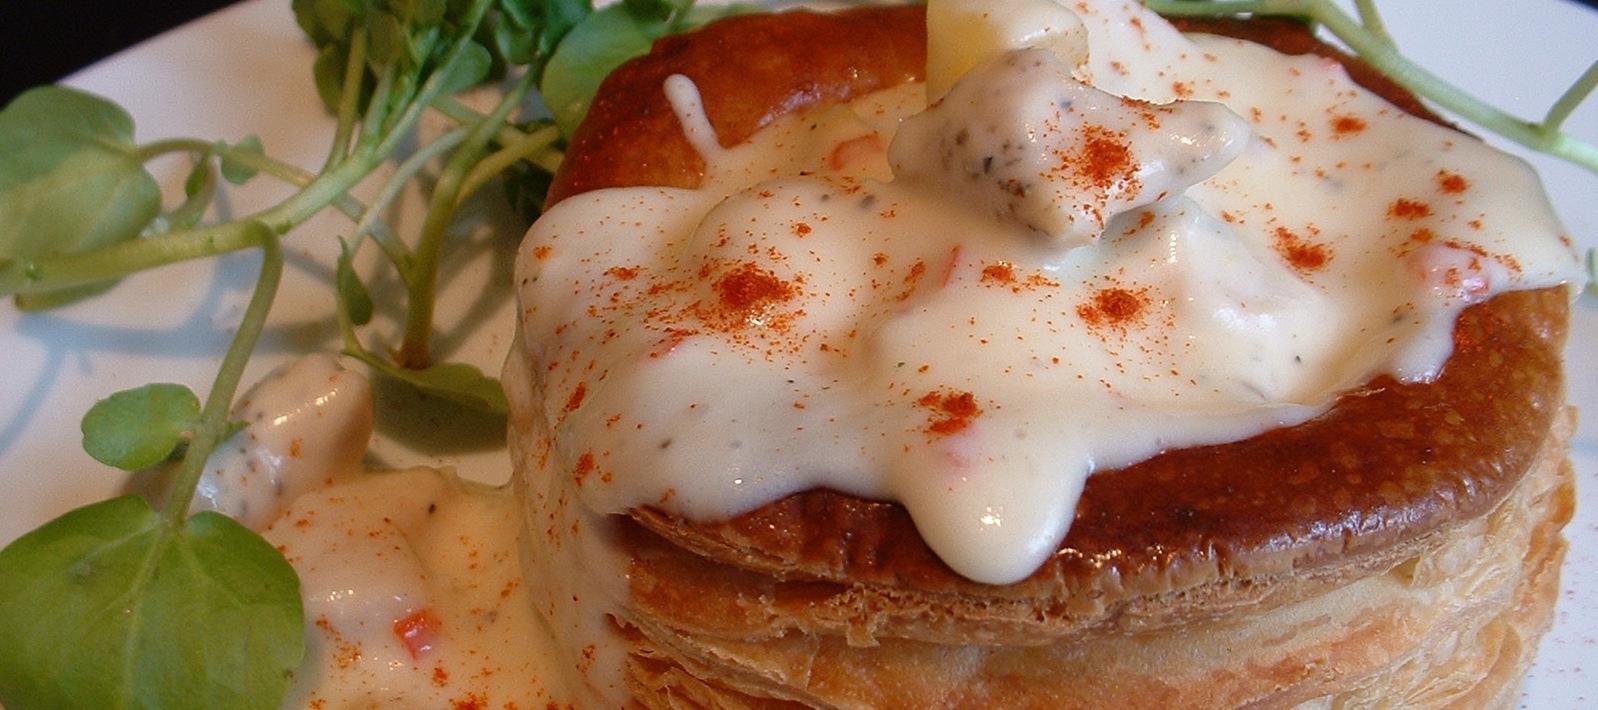 Mushroom duxelle recipe | Mushroom stuffing | Duxelle